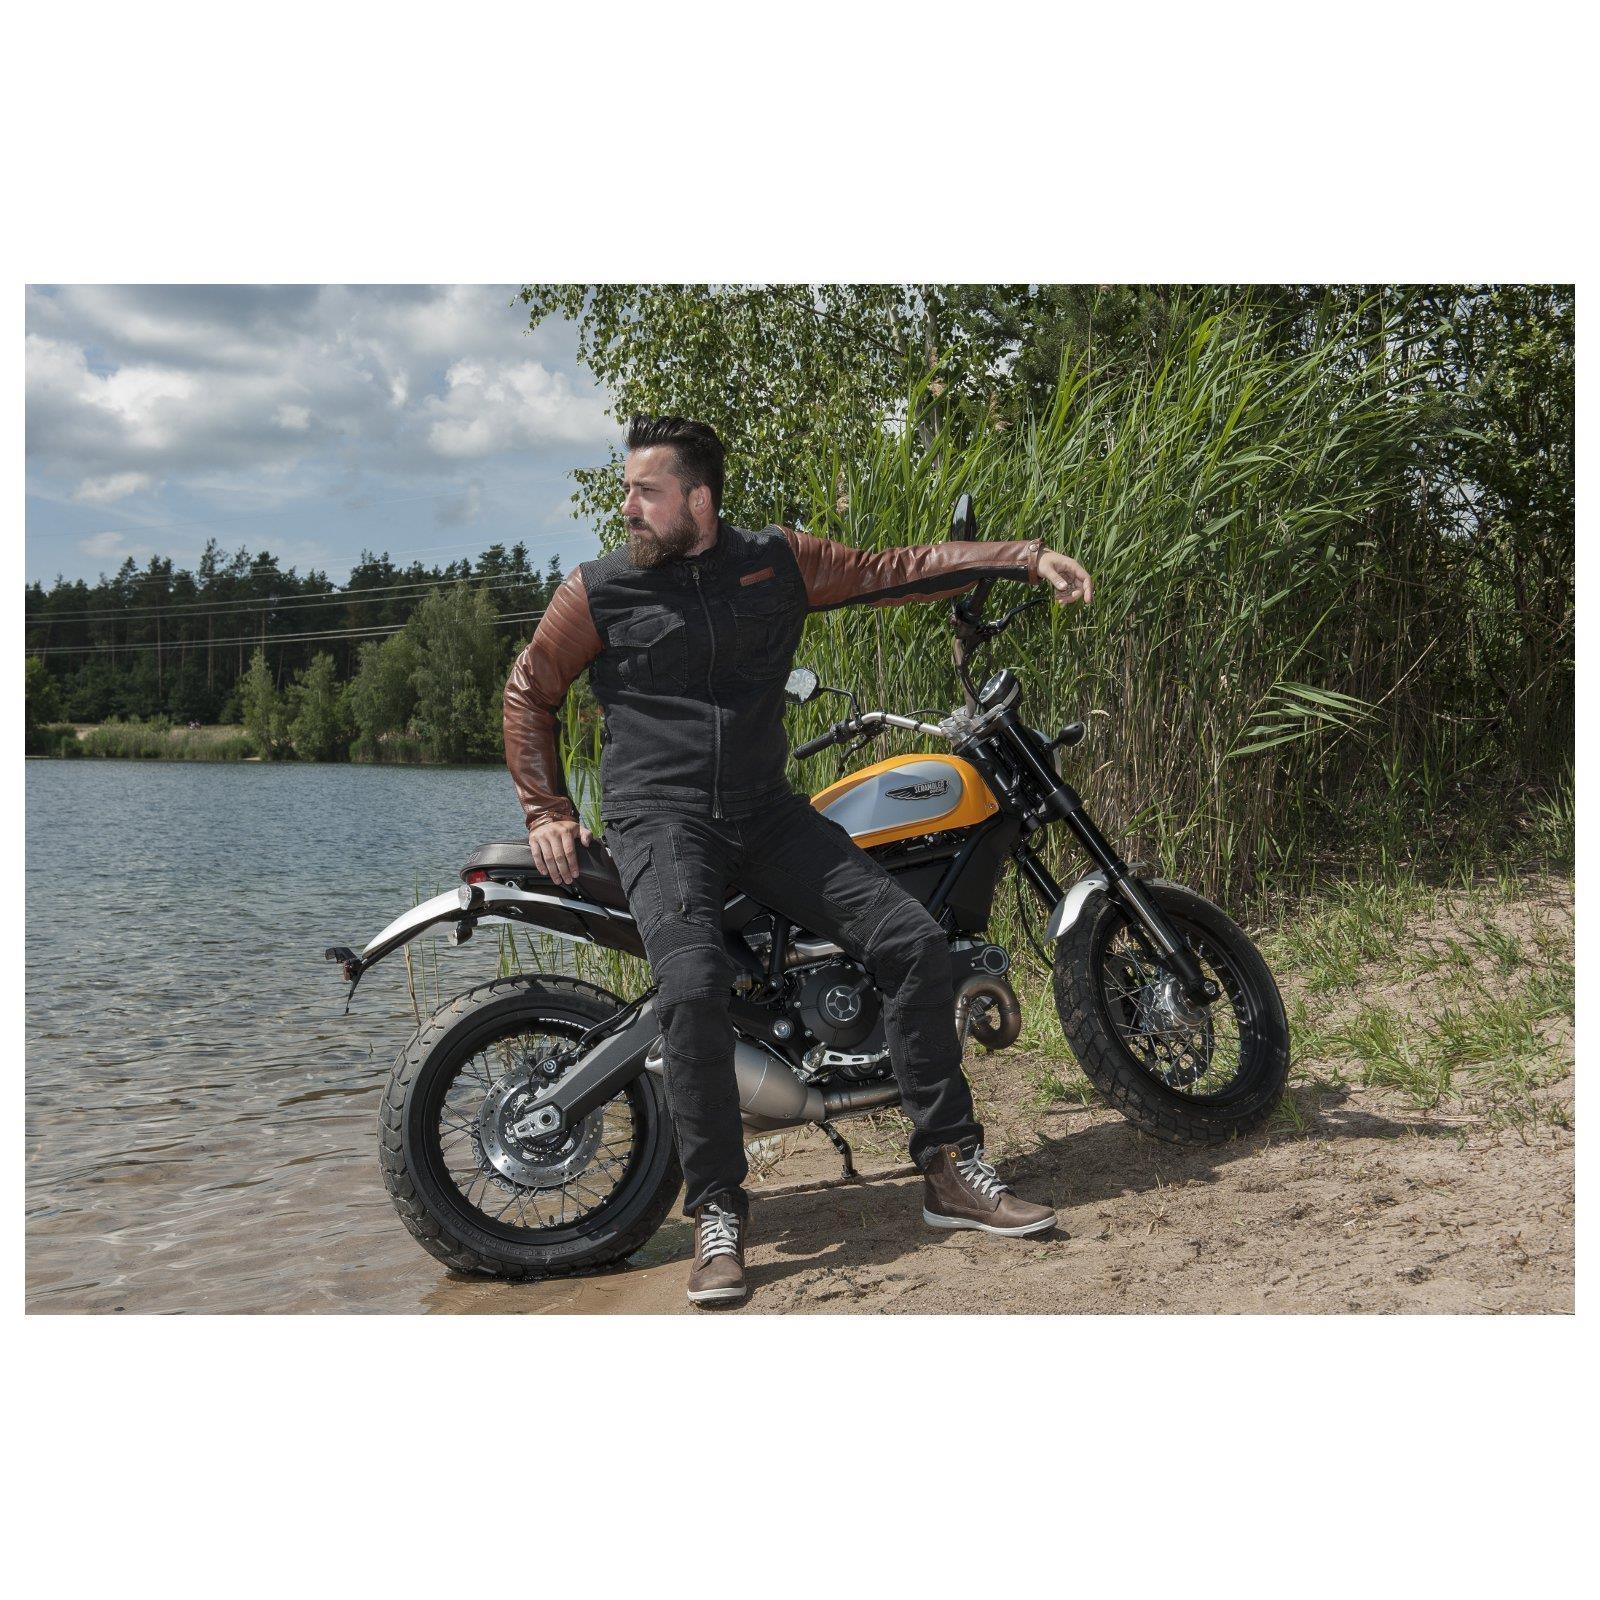 Trilobite-Pantaloni-Moto-Jeans-Abbigliamento-Parado-MICAS-URBAN-DUAL-PANTS-ACID miniatura 36